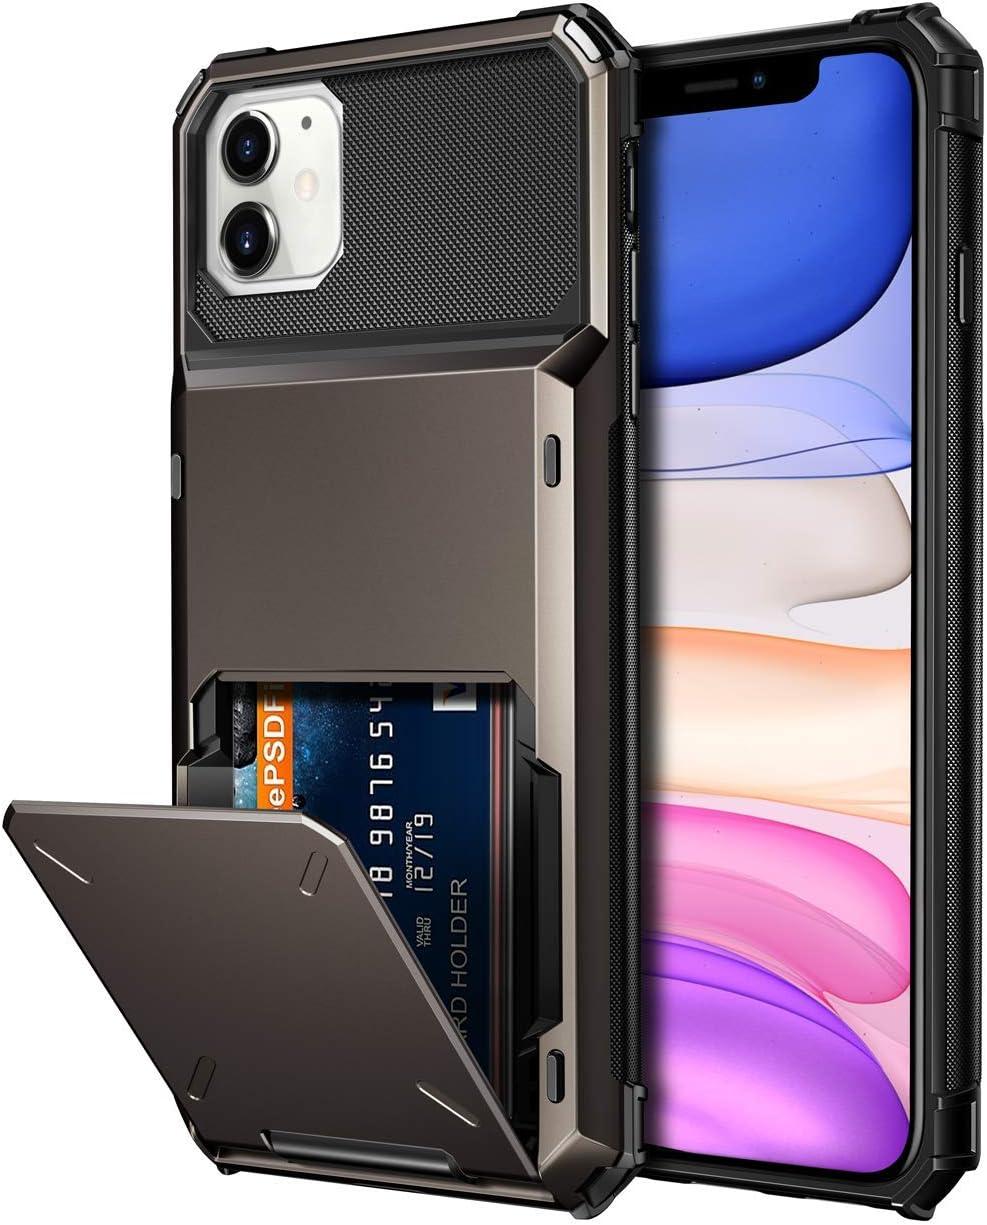 Vofolen Case for iPhone 11 Case Wallet 4-Card Holder ID Slot Flip Door Hidden Pocket Anti-Scratch Dual Layer Hybrid TPU Bumper Armor Protective Hard Shell Back Cover for iPhone 11 6.1 inch Gun Metal